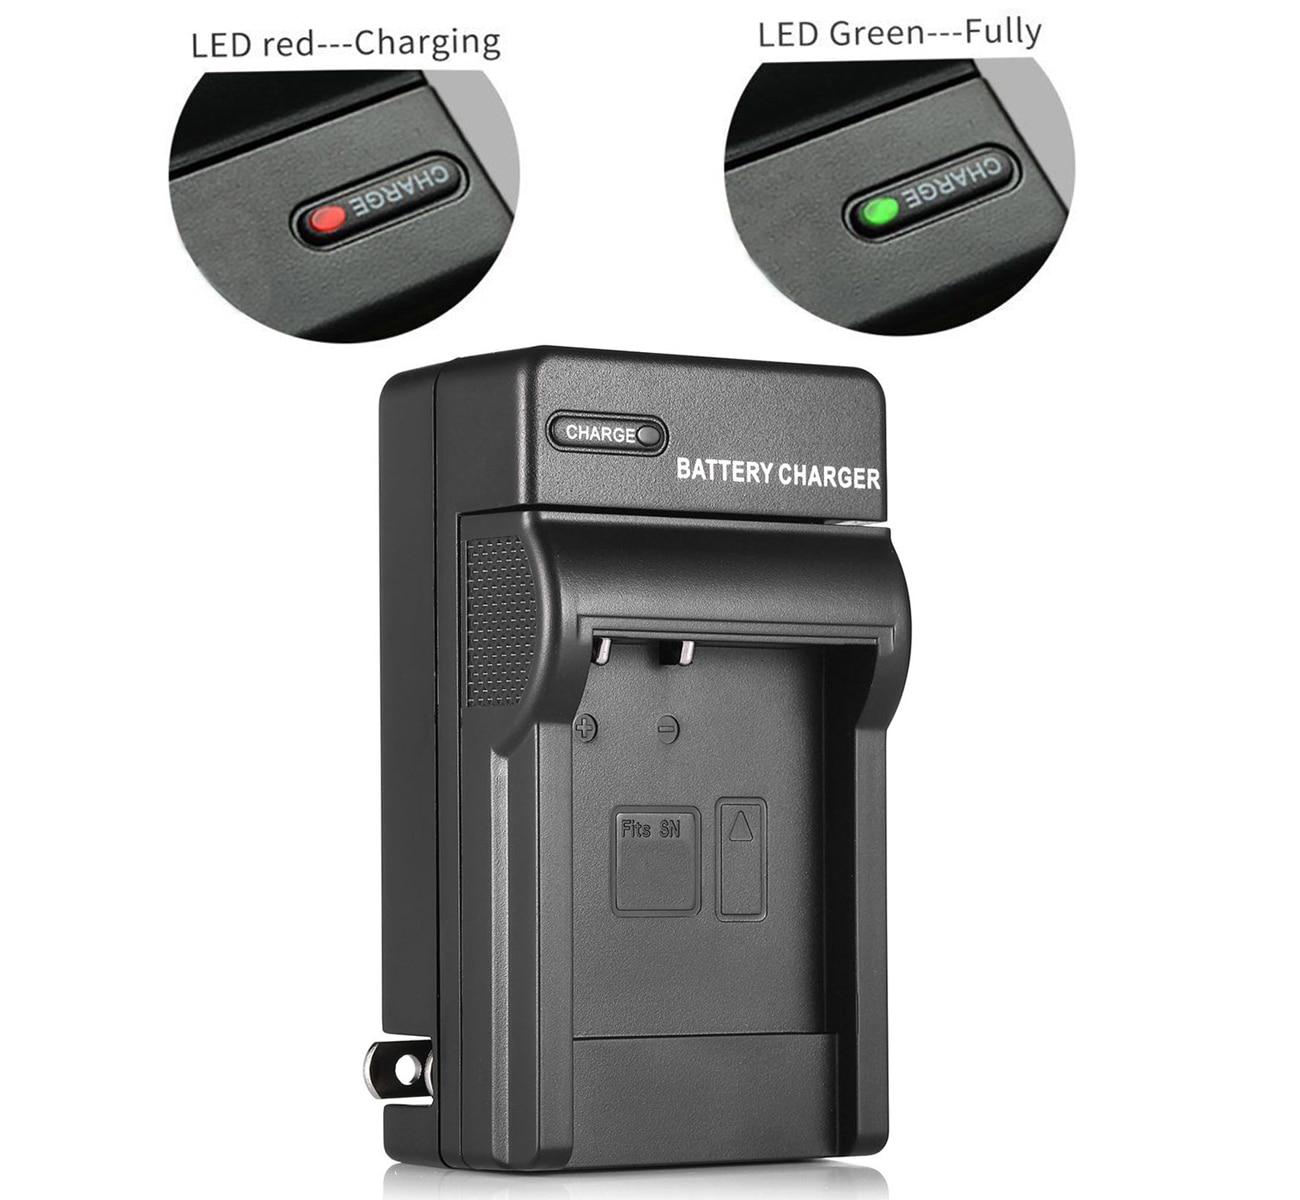 HC-WXF991 HC-WXF995 4K Ultra HD Camcorder USB Dual Battery Charger for Panasonic HC-WXF990 HC-WXF991K